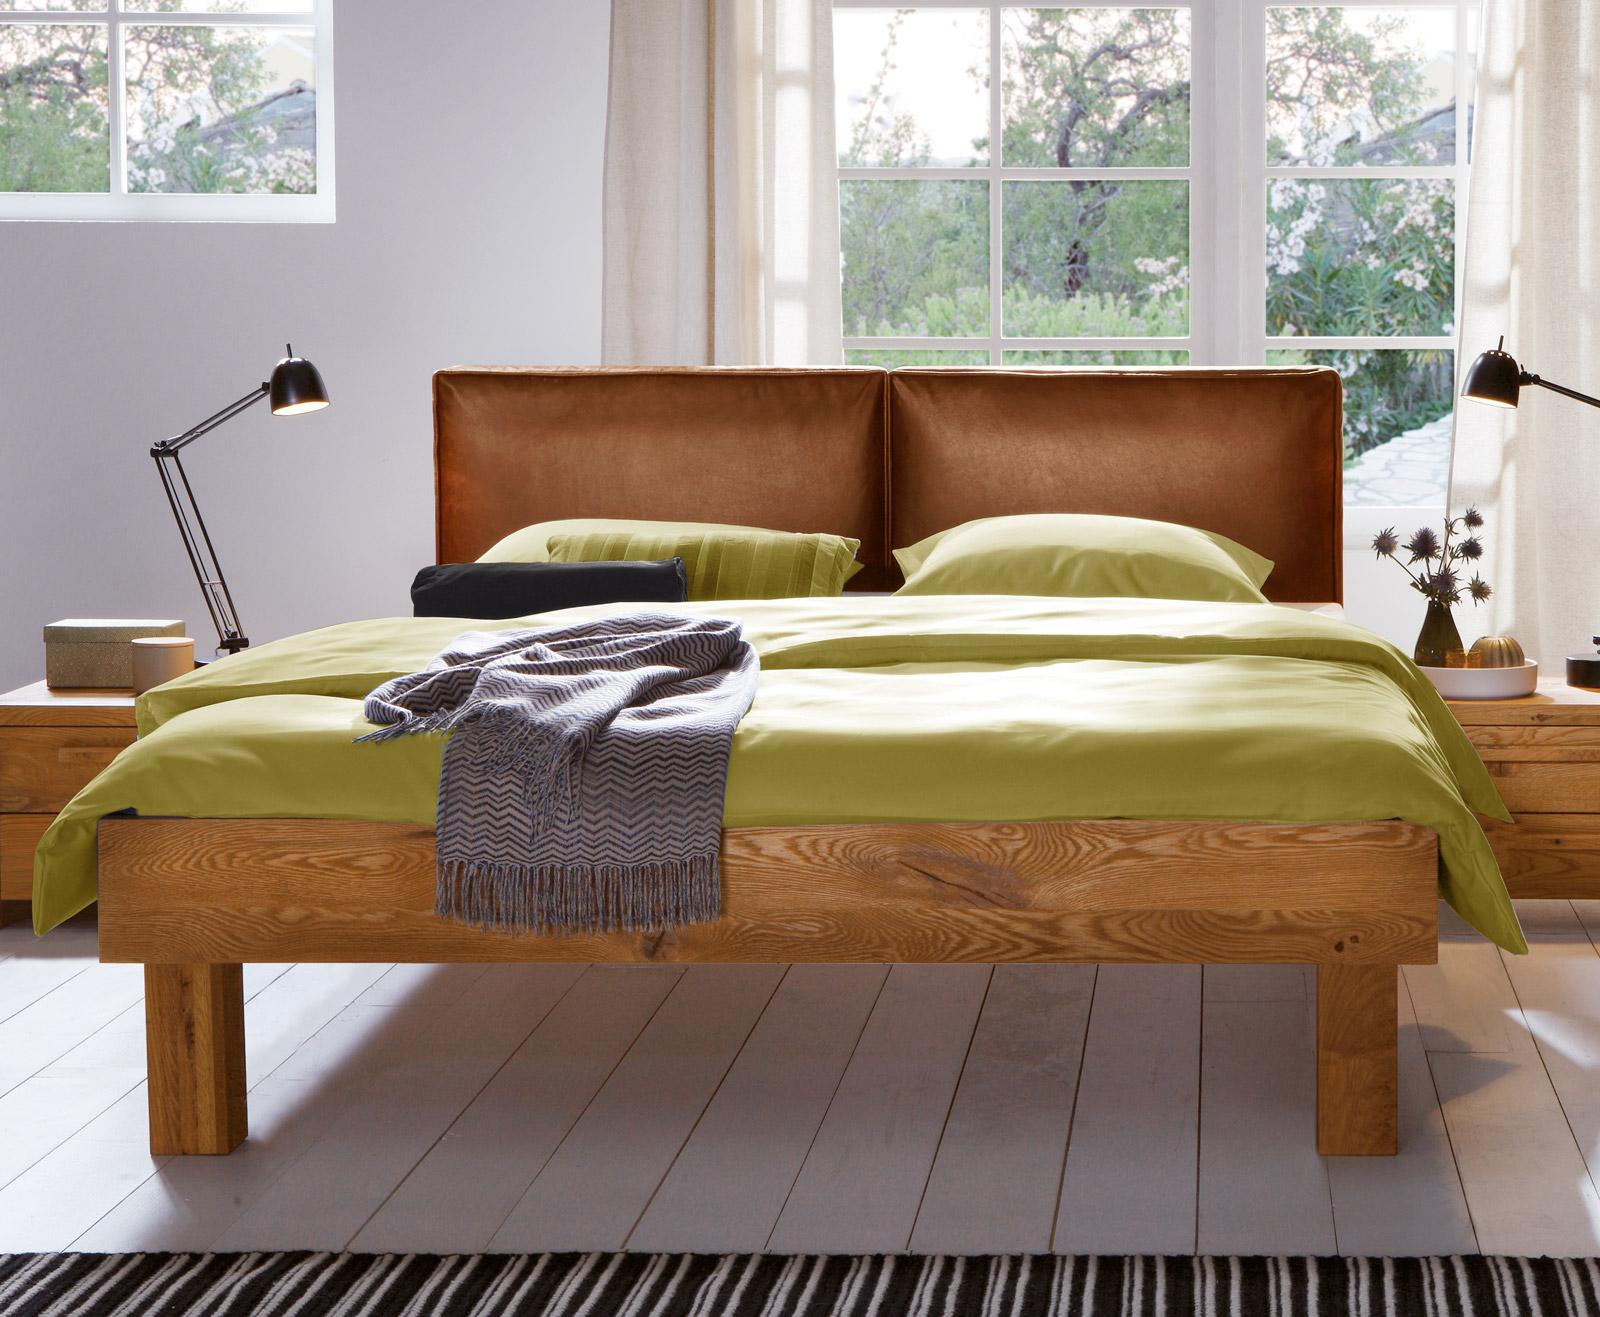 polsterbett echtleder doppelbett wei x polsterbett mit bettkasten larissa anthrazit bett. Black Bedroom Furniture Sets. Home Design Ideas